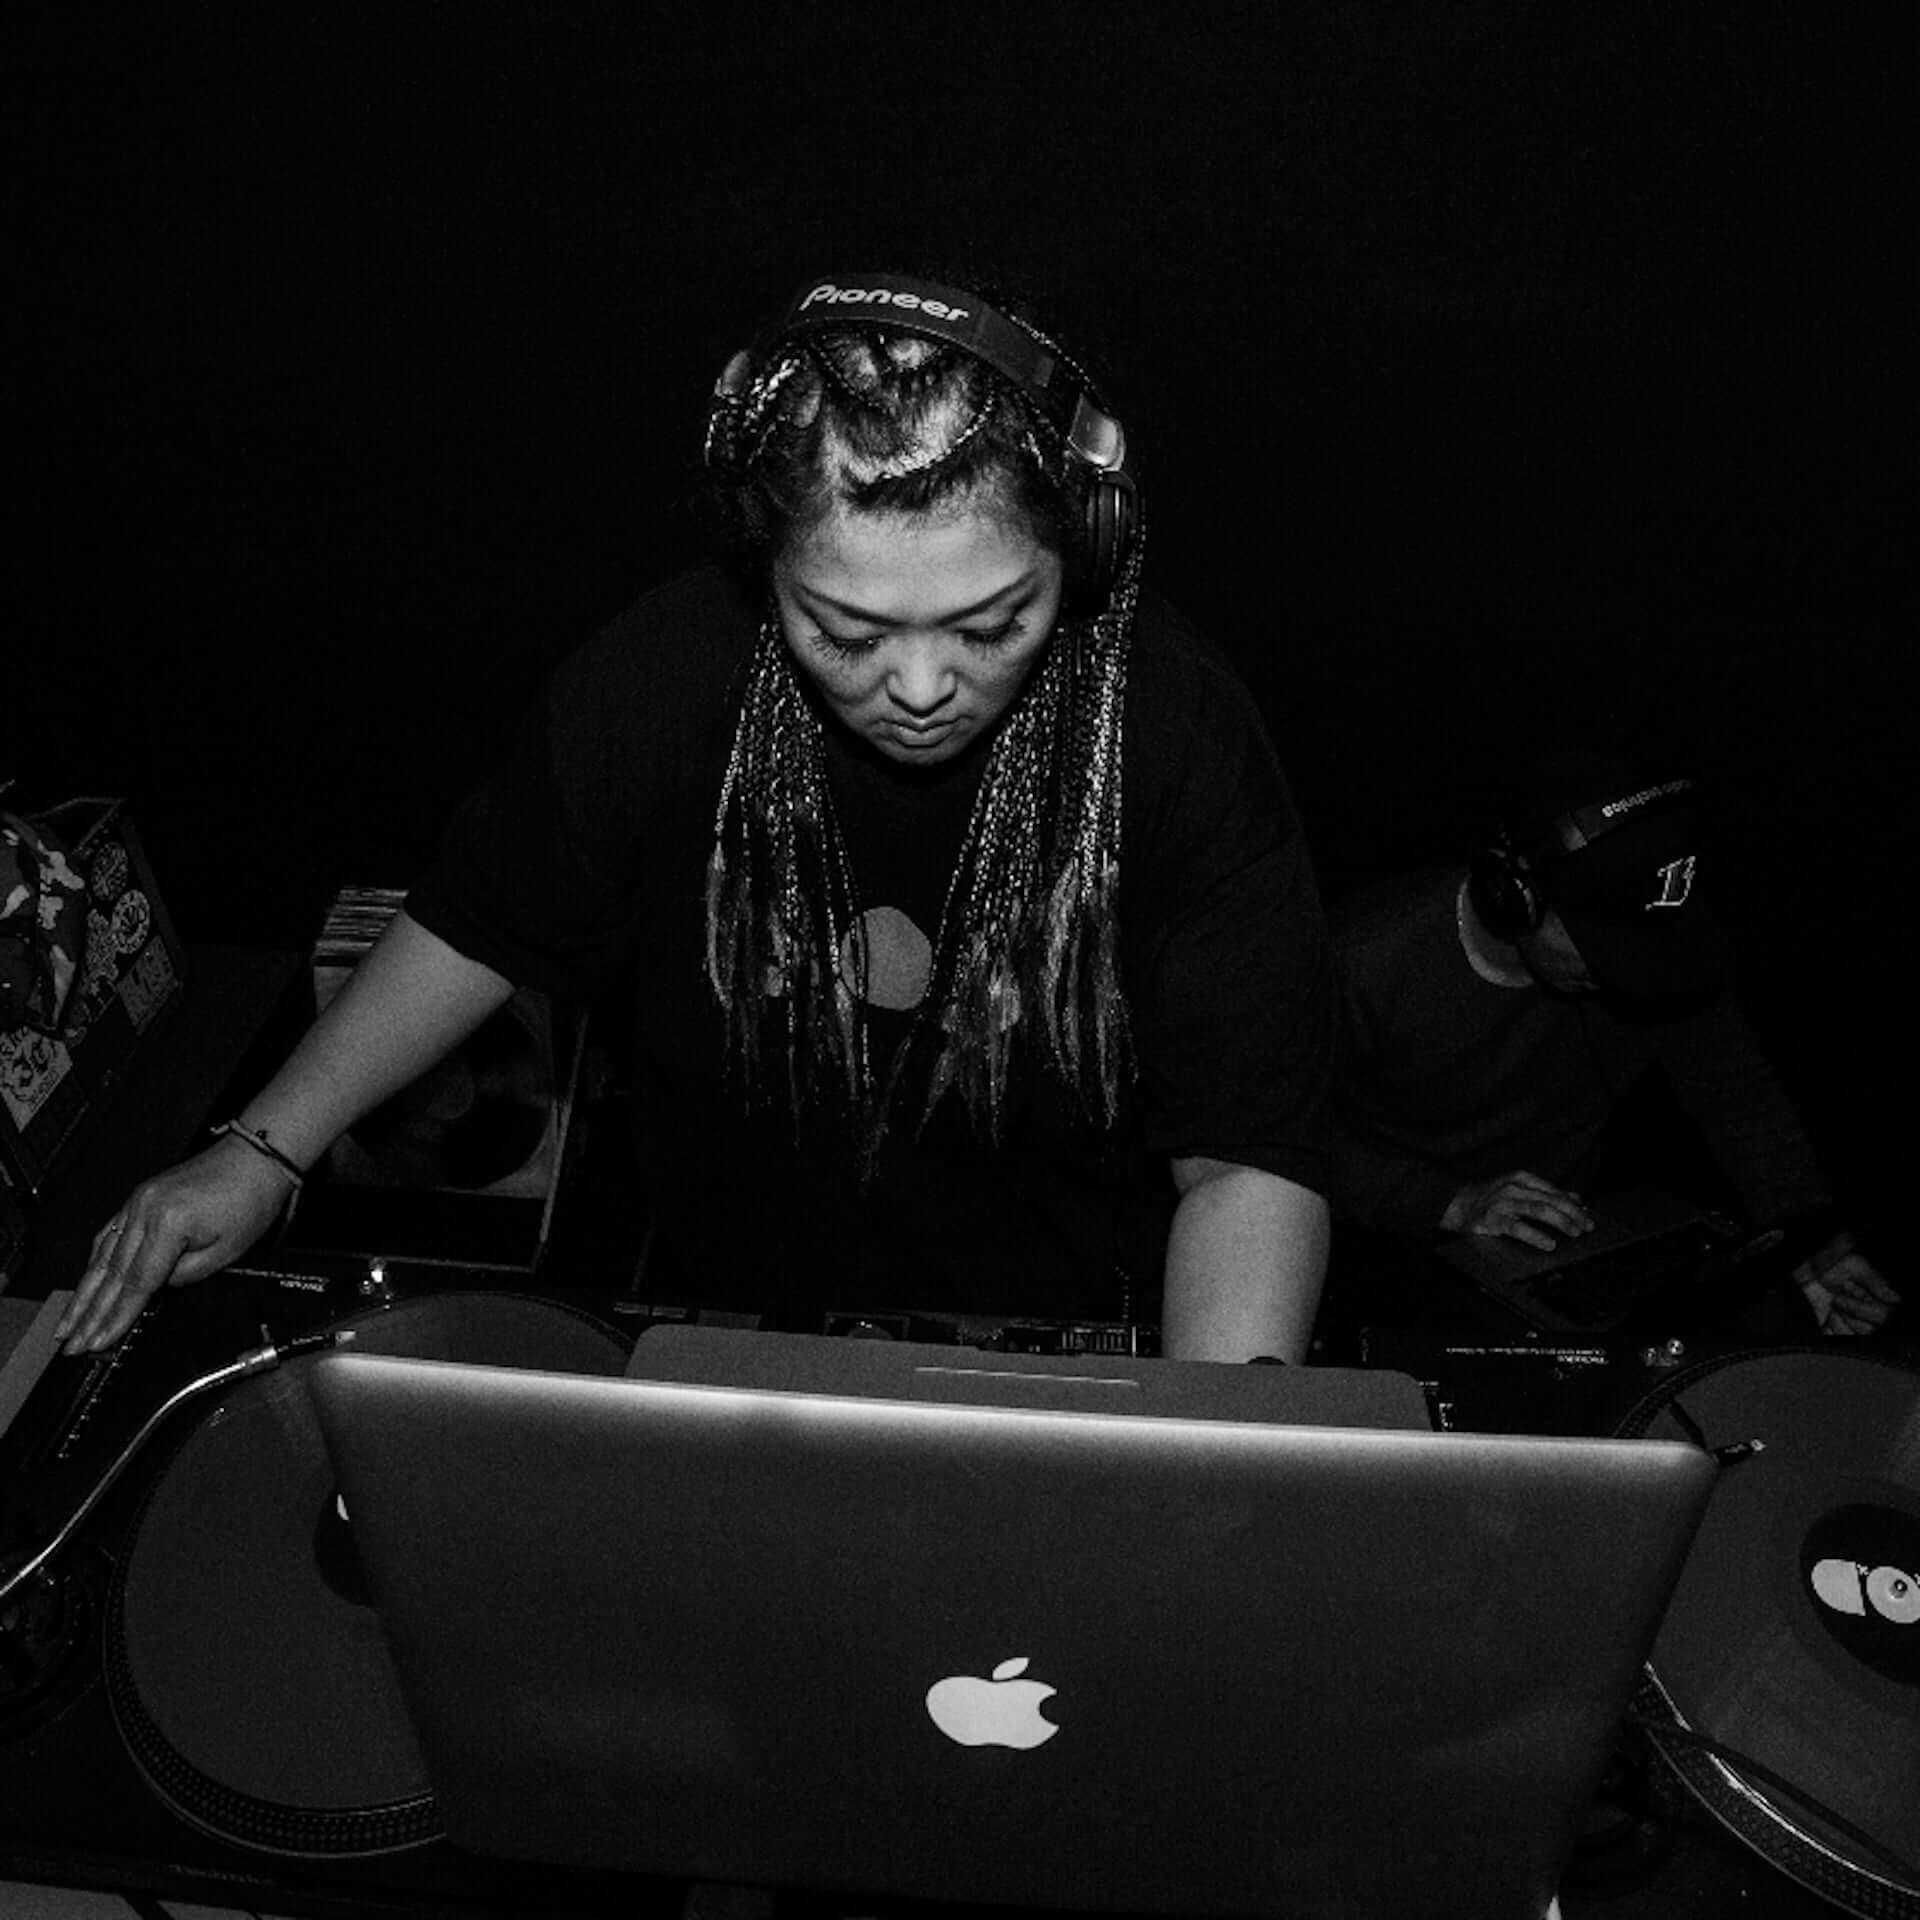 Dazzle Drums主催ハウスパーティー<Music Of Many Colours>が渋谷Contactで開催決定!DJ Azusa、TOYODAらが登場 music201112_contact_2-1920x1920